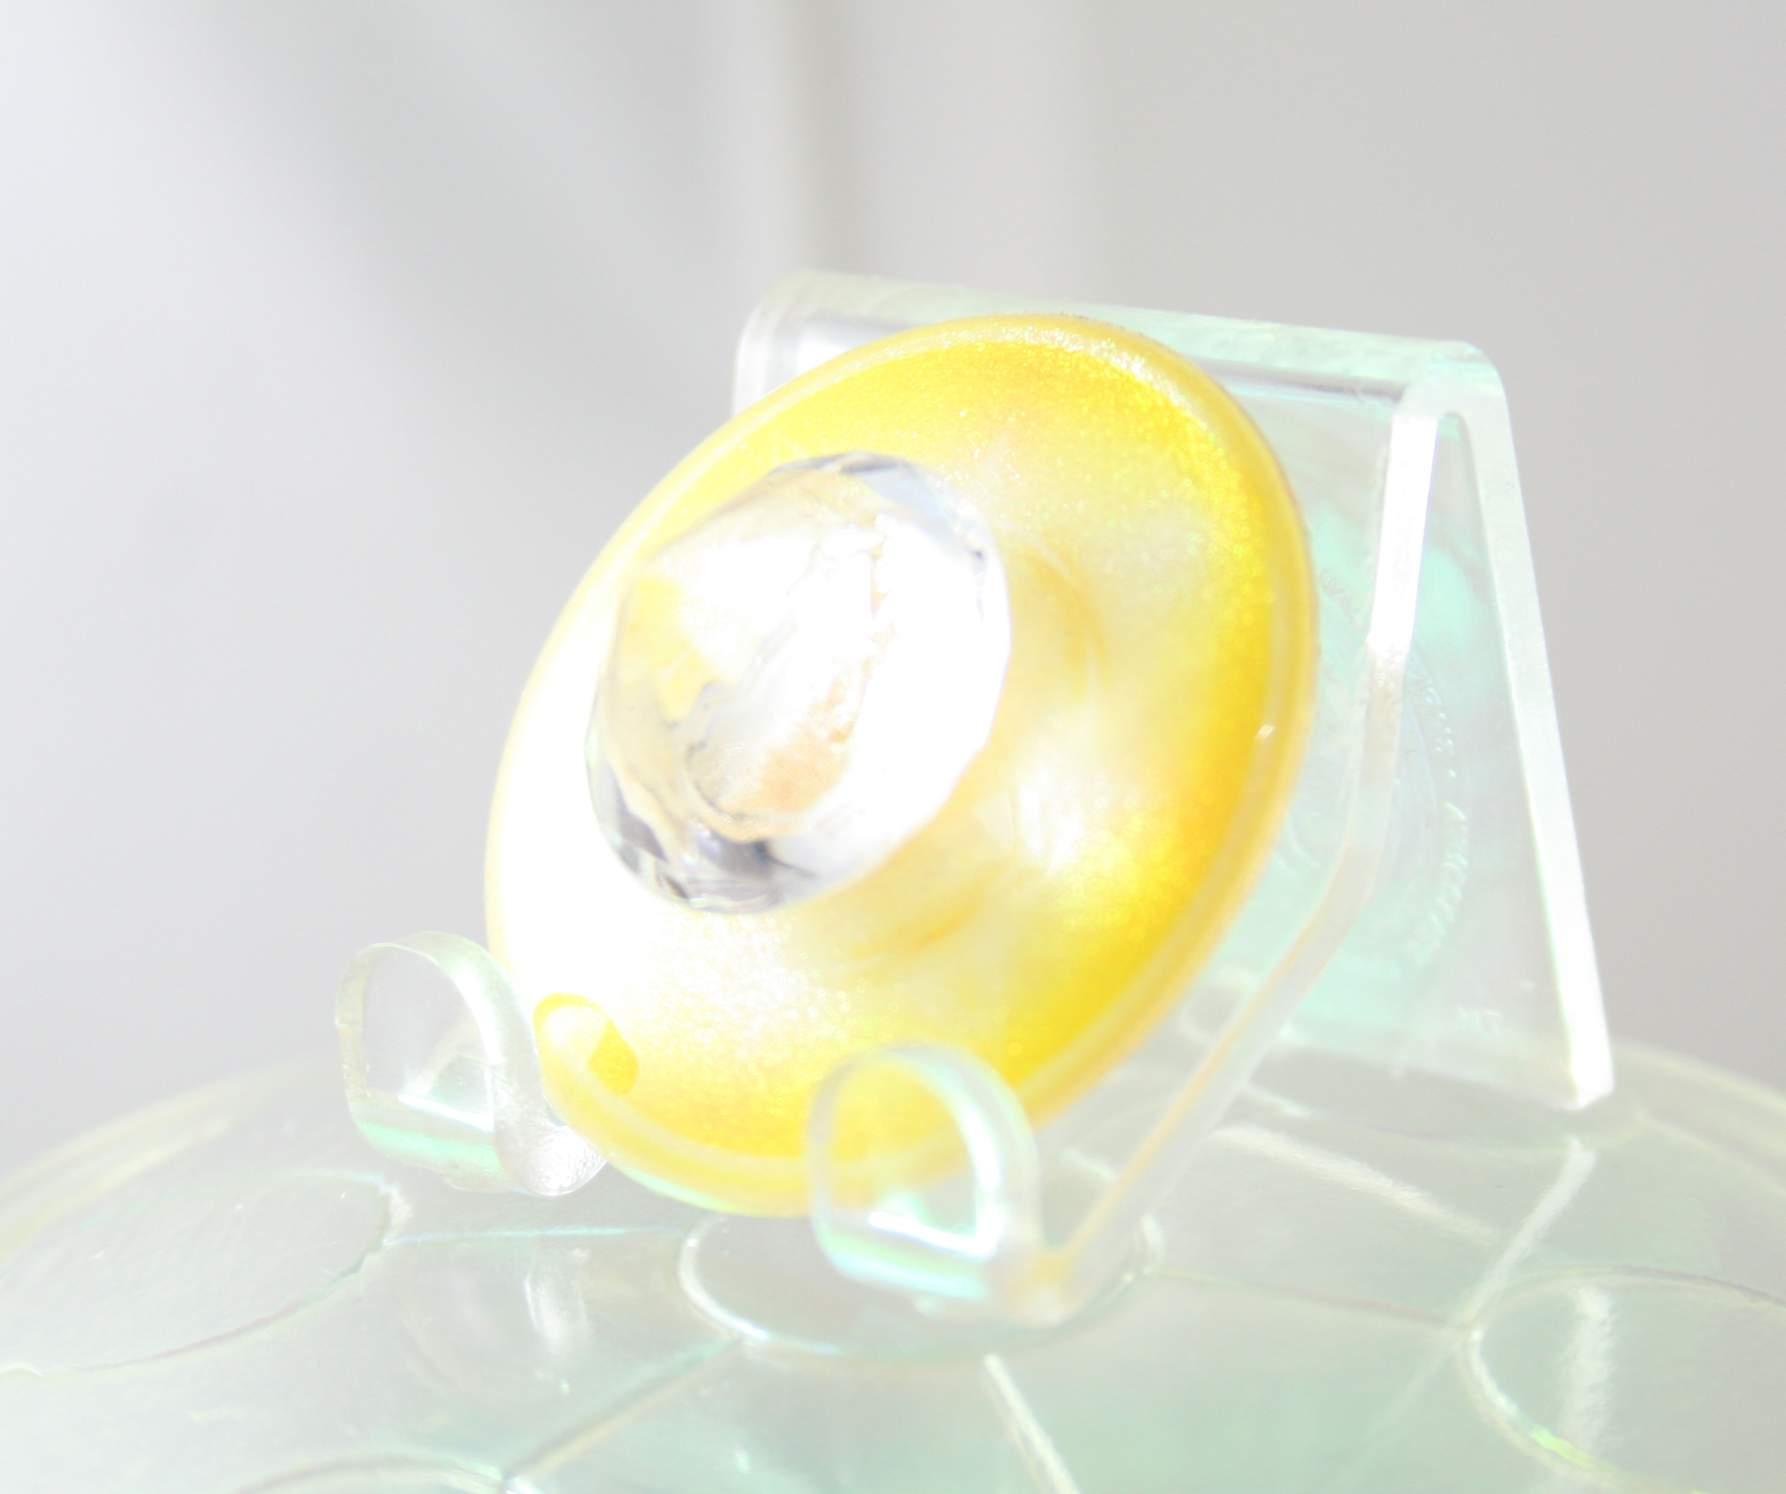 crystal_tempest_star-singleflat-clear01